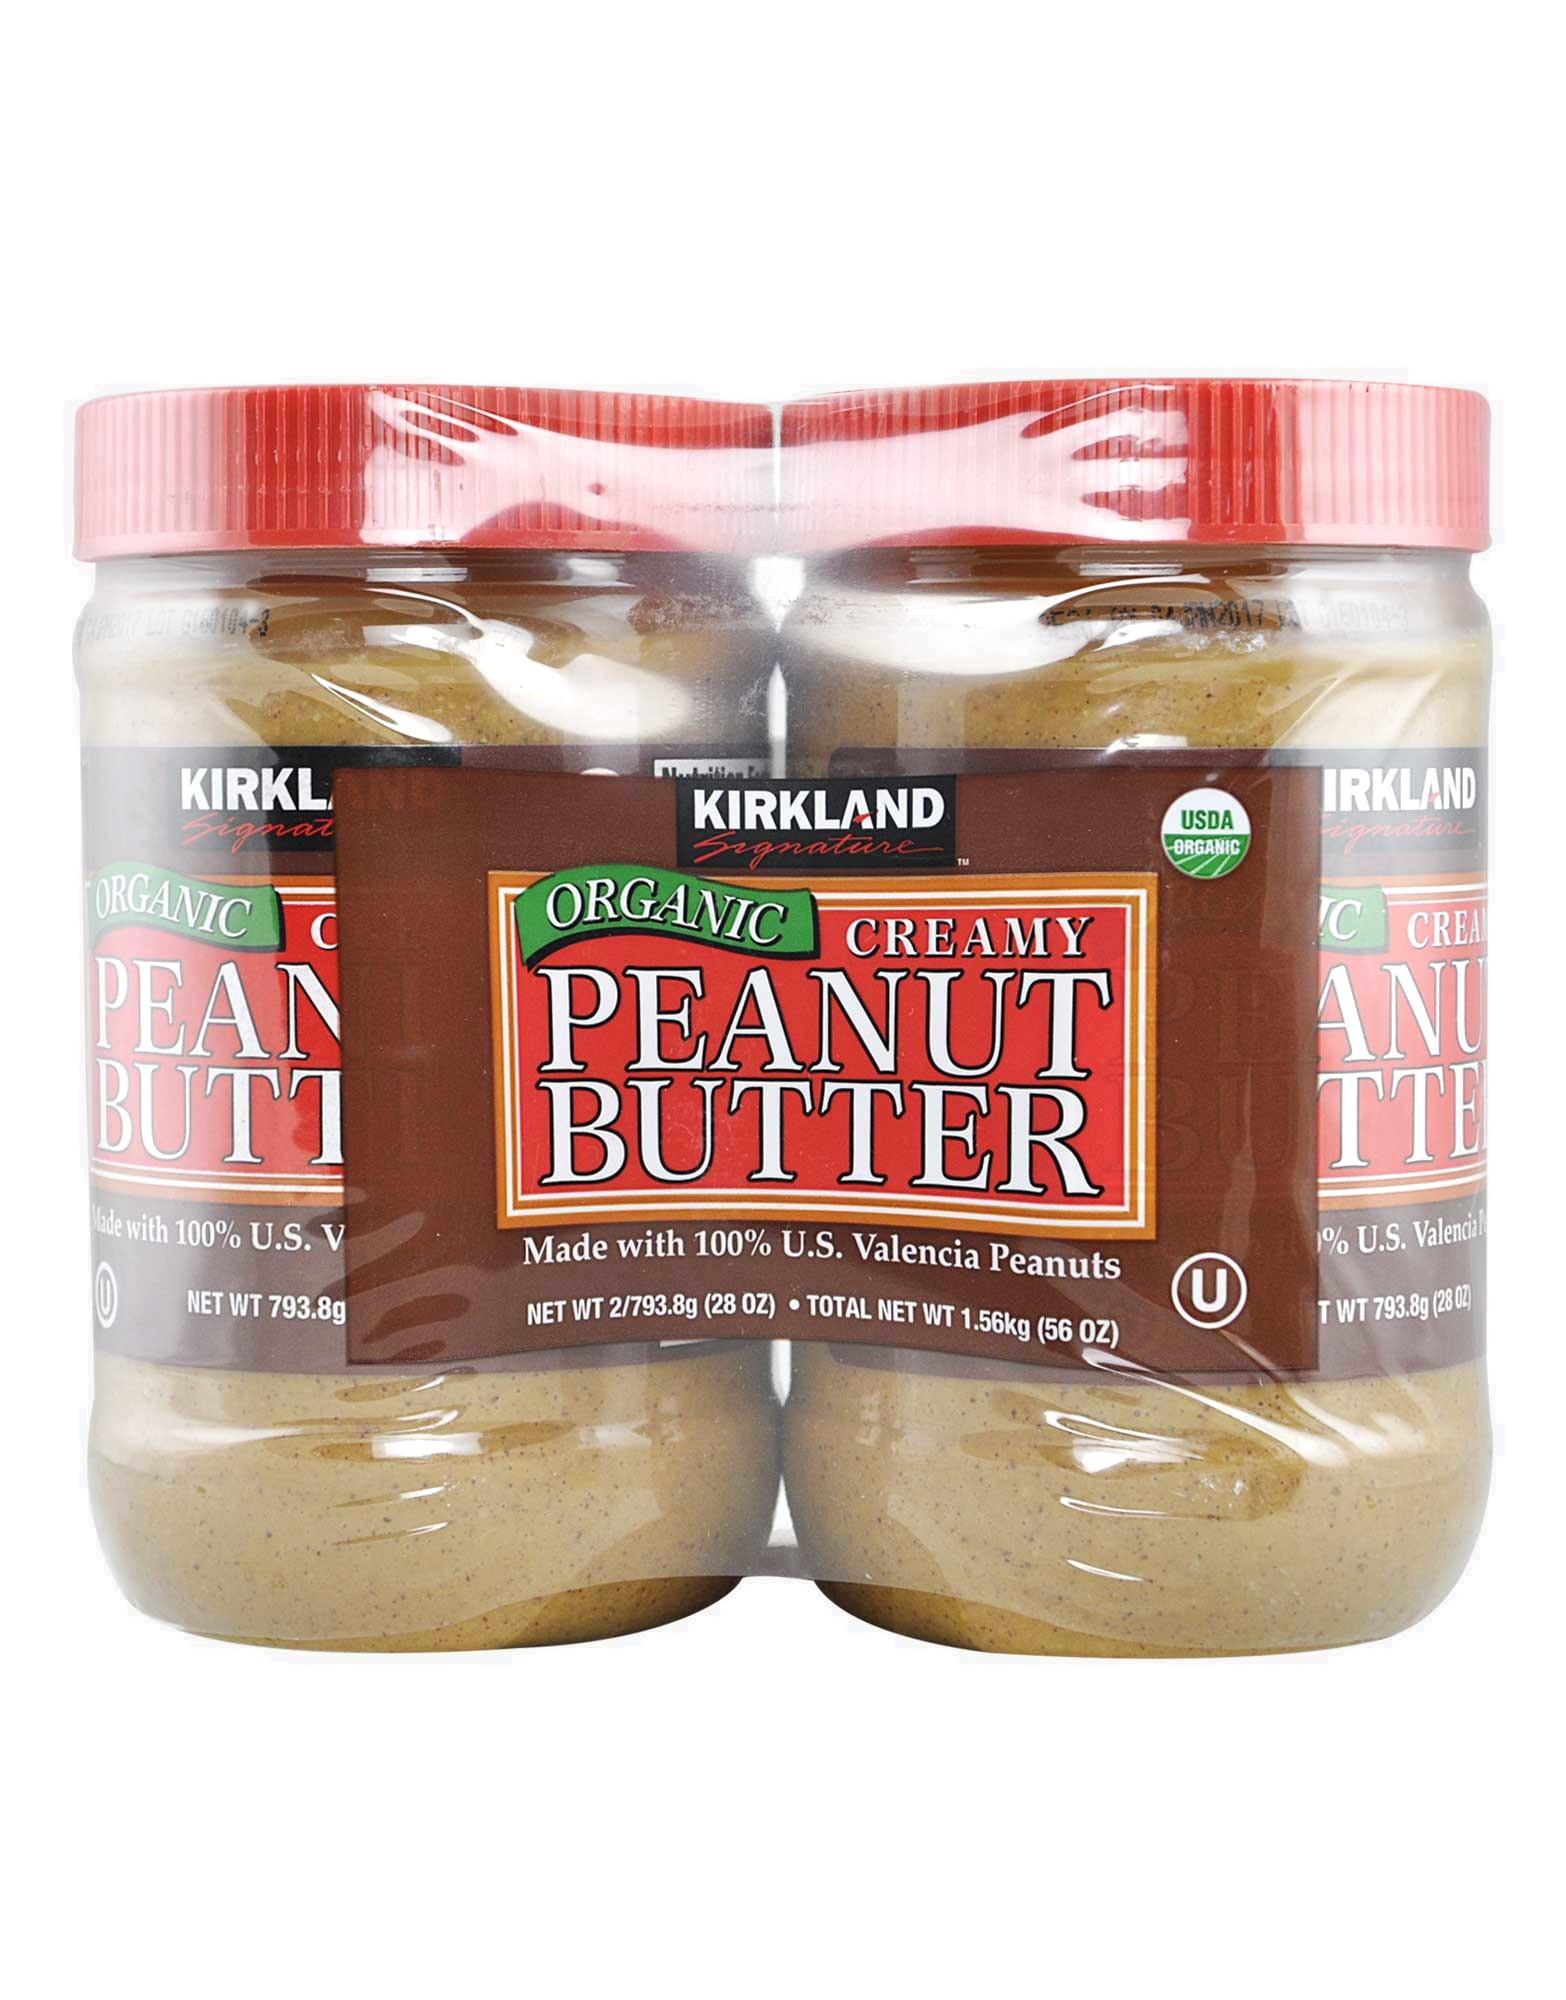 Organic Creamy Peanut Butter by Kirkland signature, 2 jars of